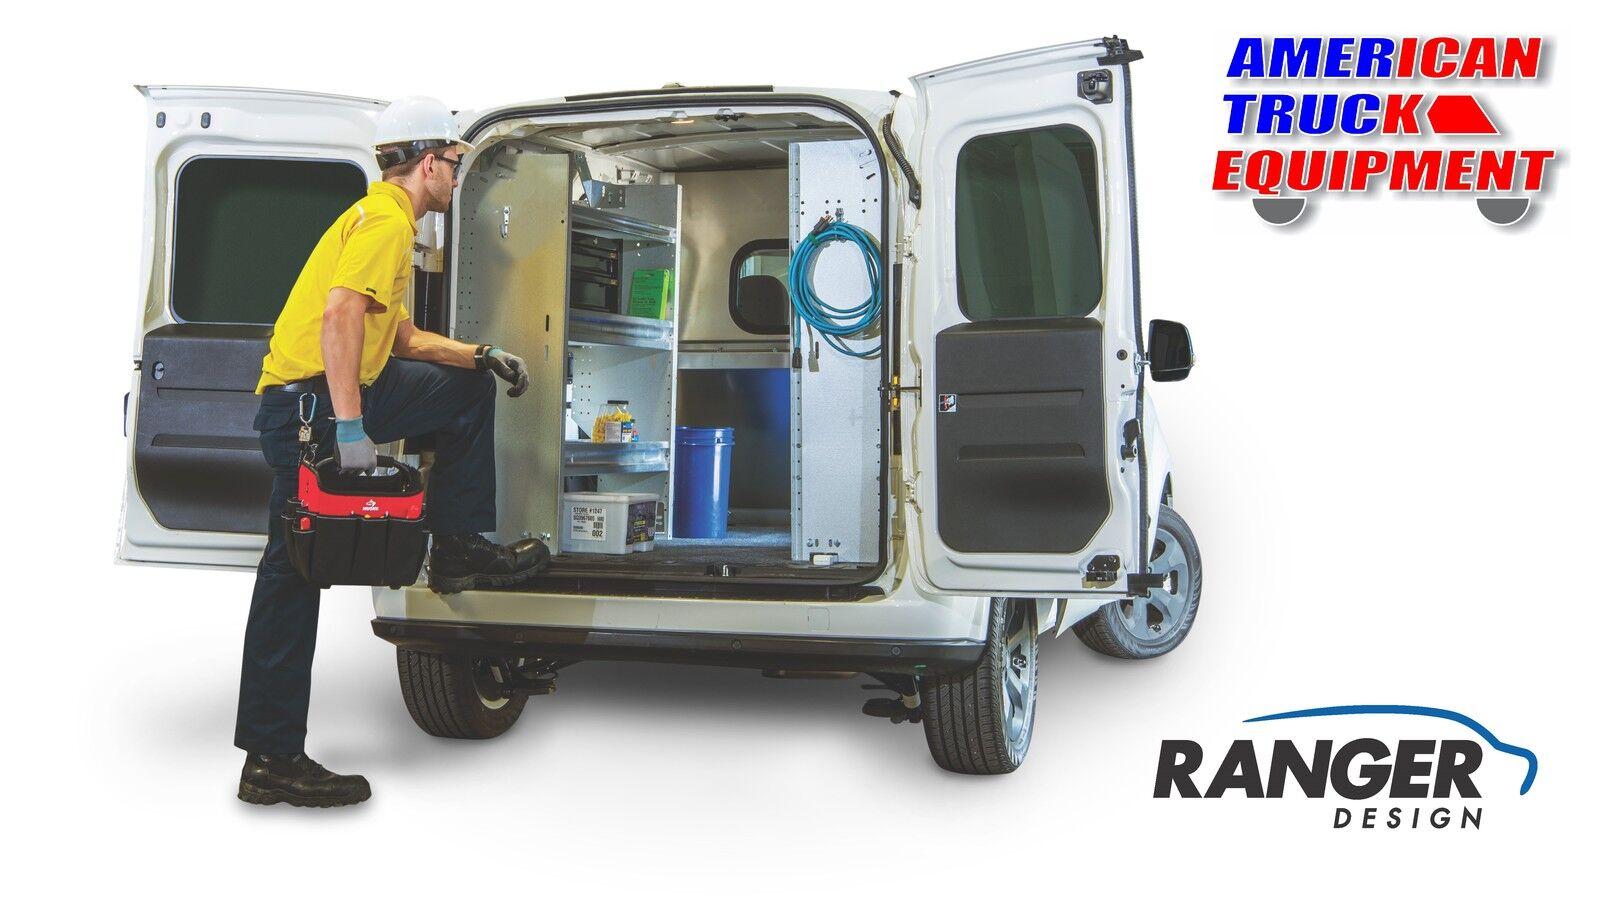 American Truck Equipment